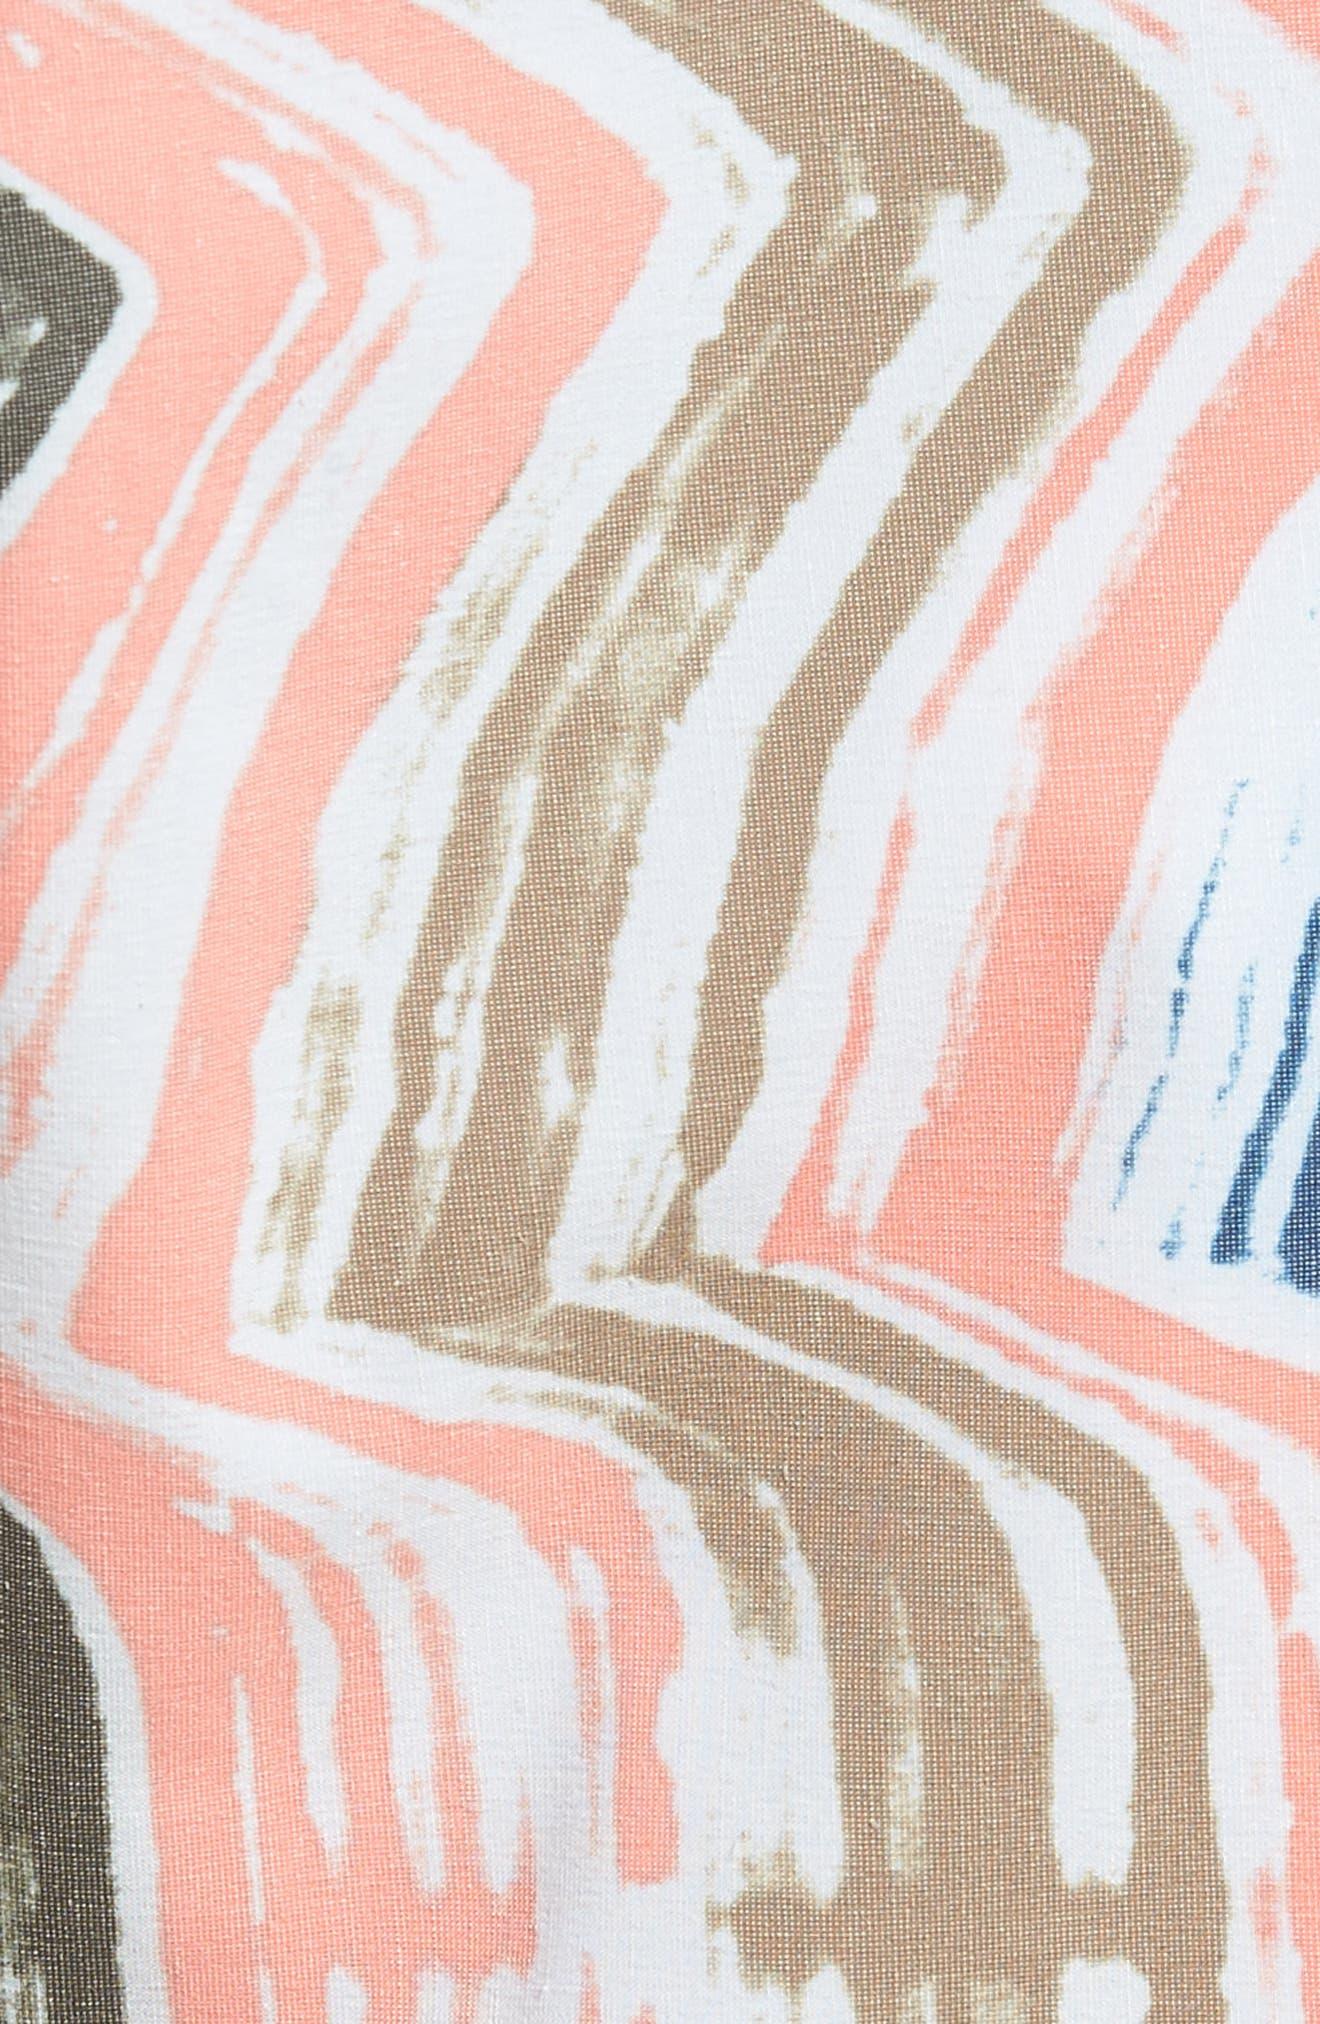 Lo-Fi Stoney Board Shorts,                             Alternate thumbnail 36, color,